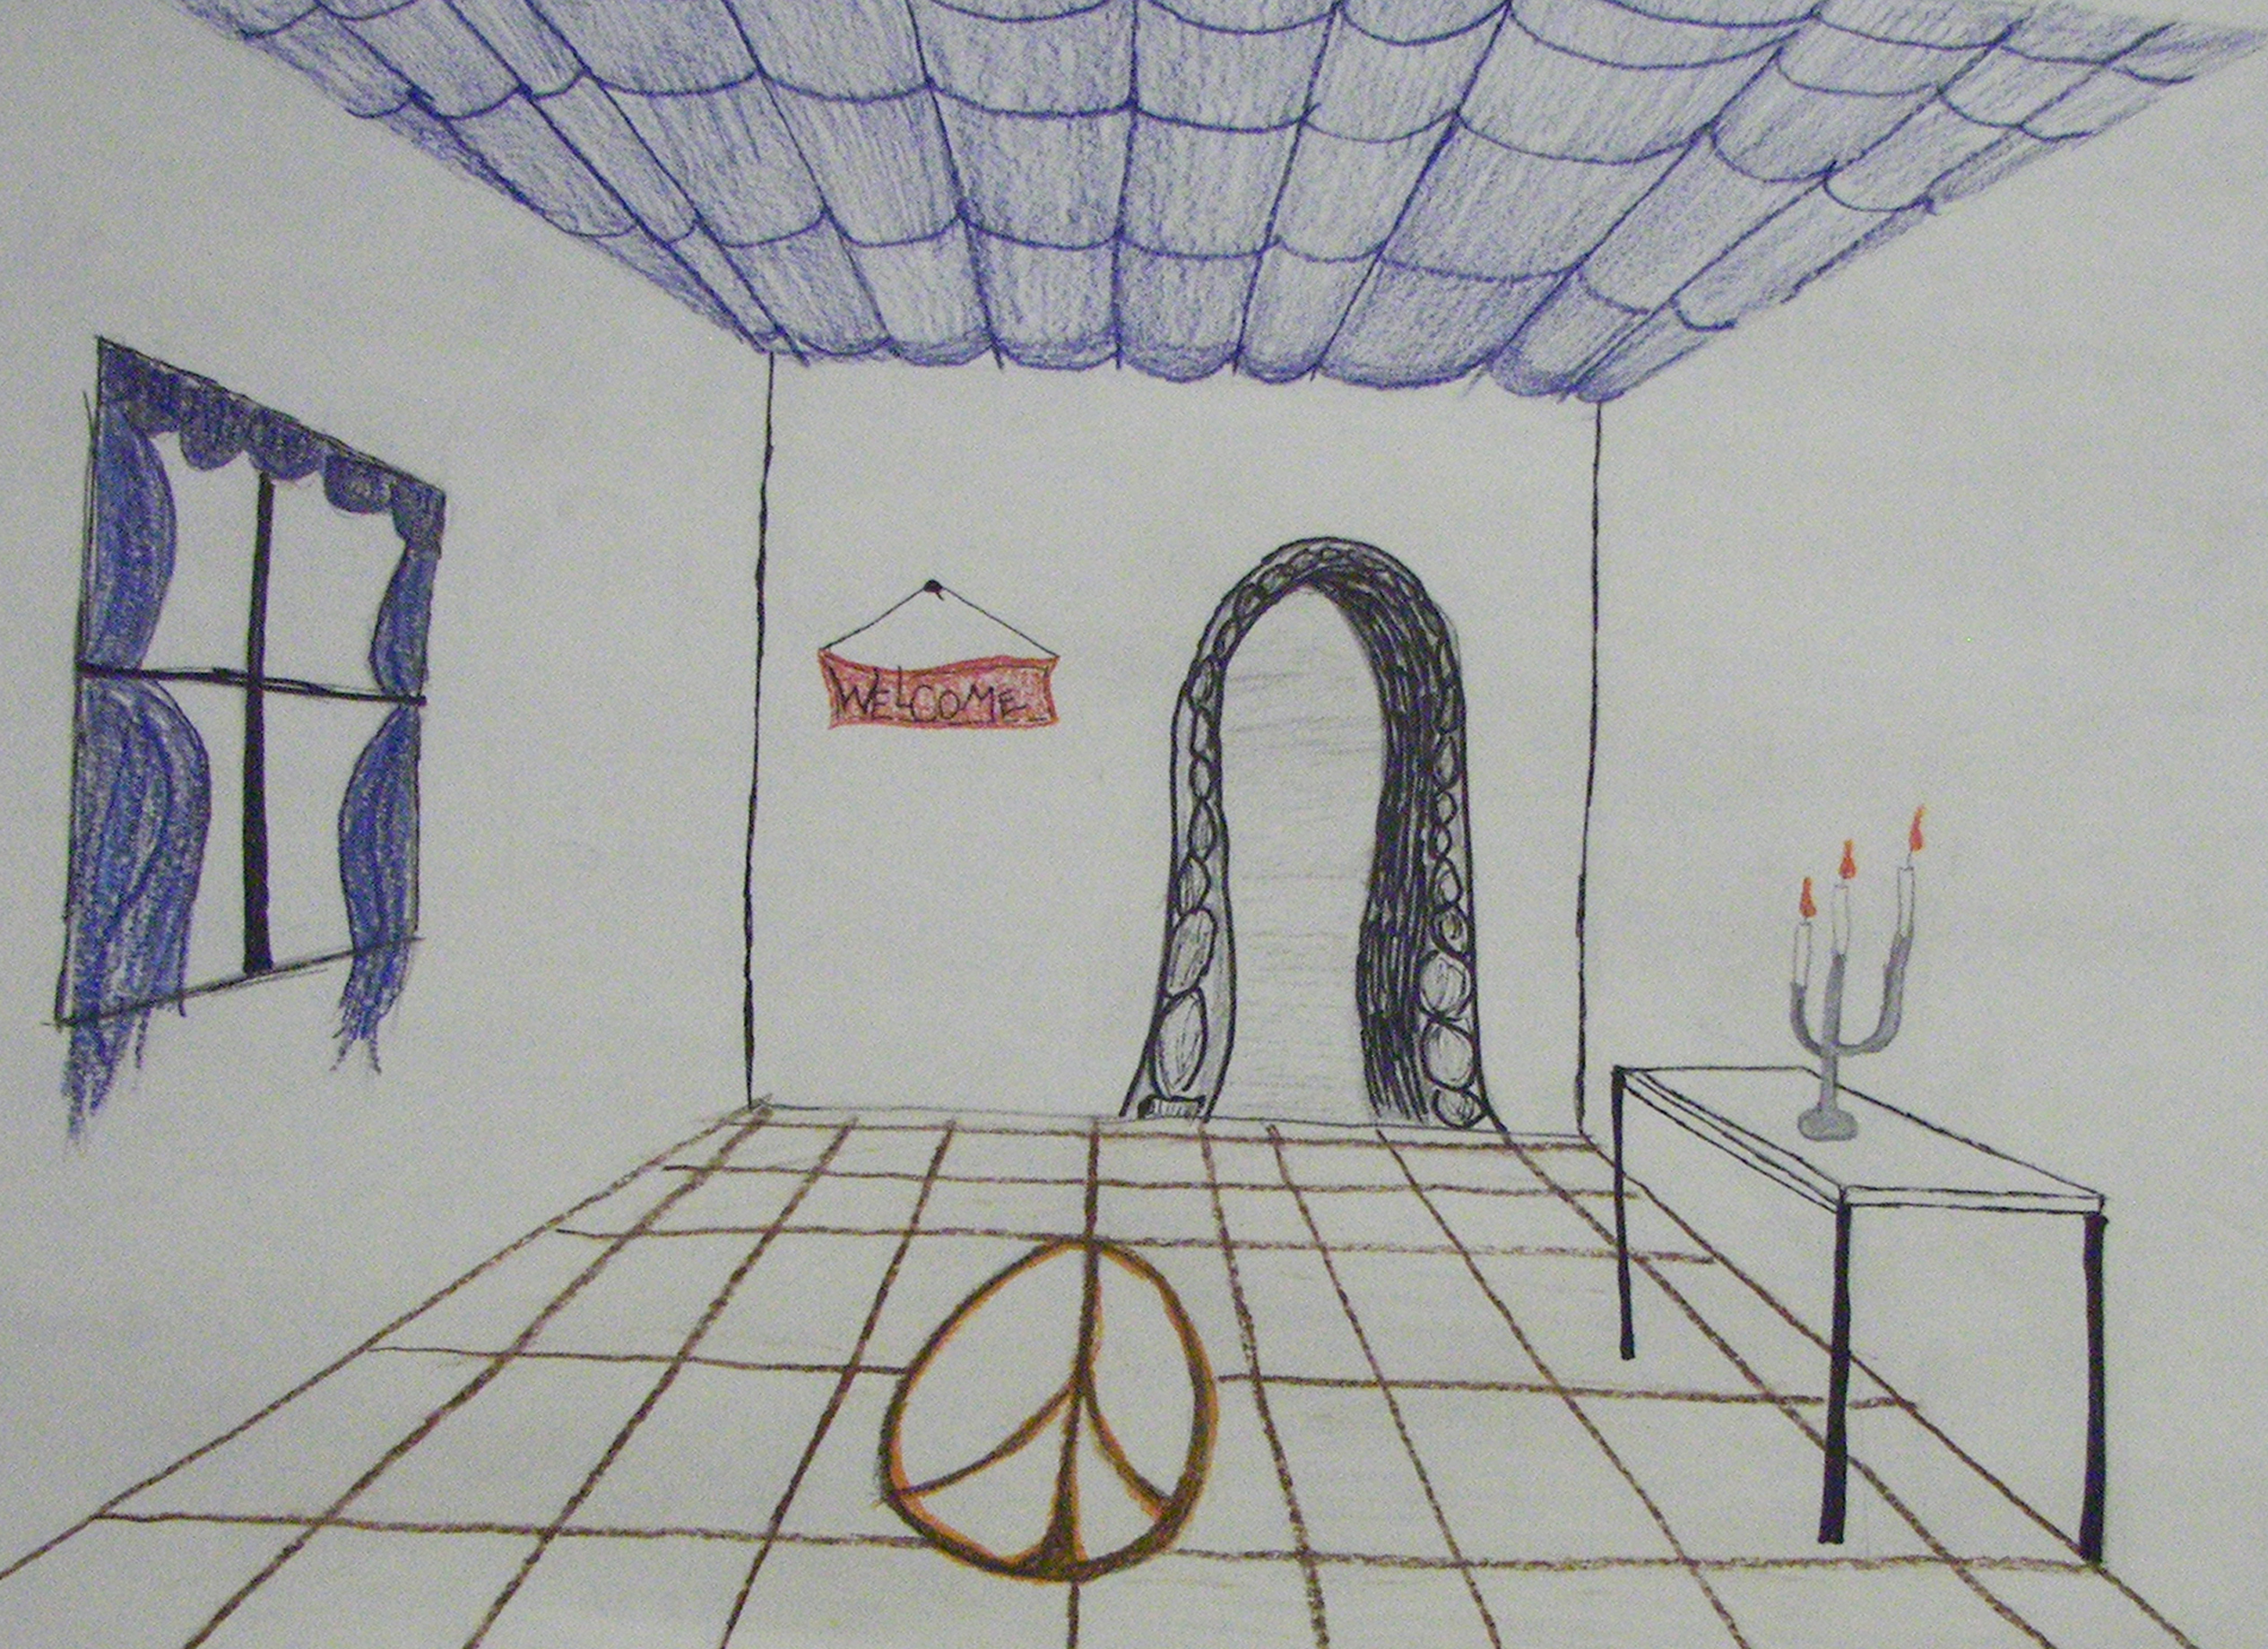 Drawn room line drawing Drawing vanishing Room single Room